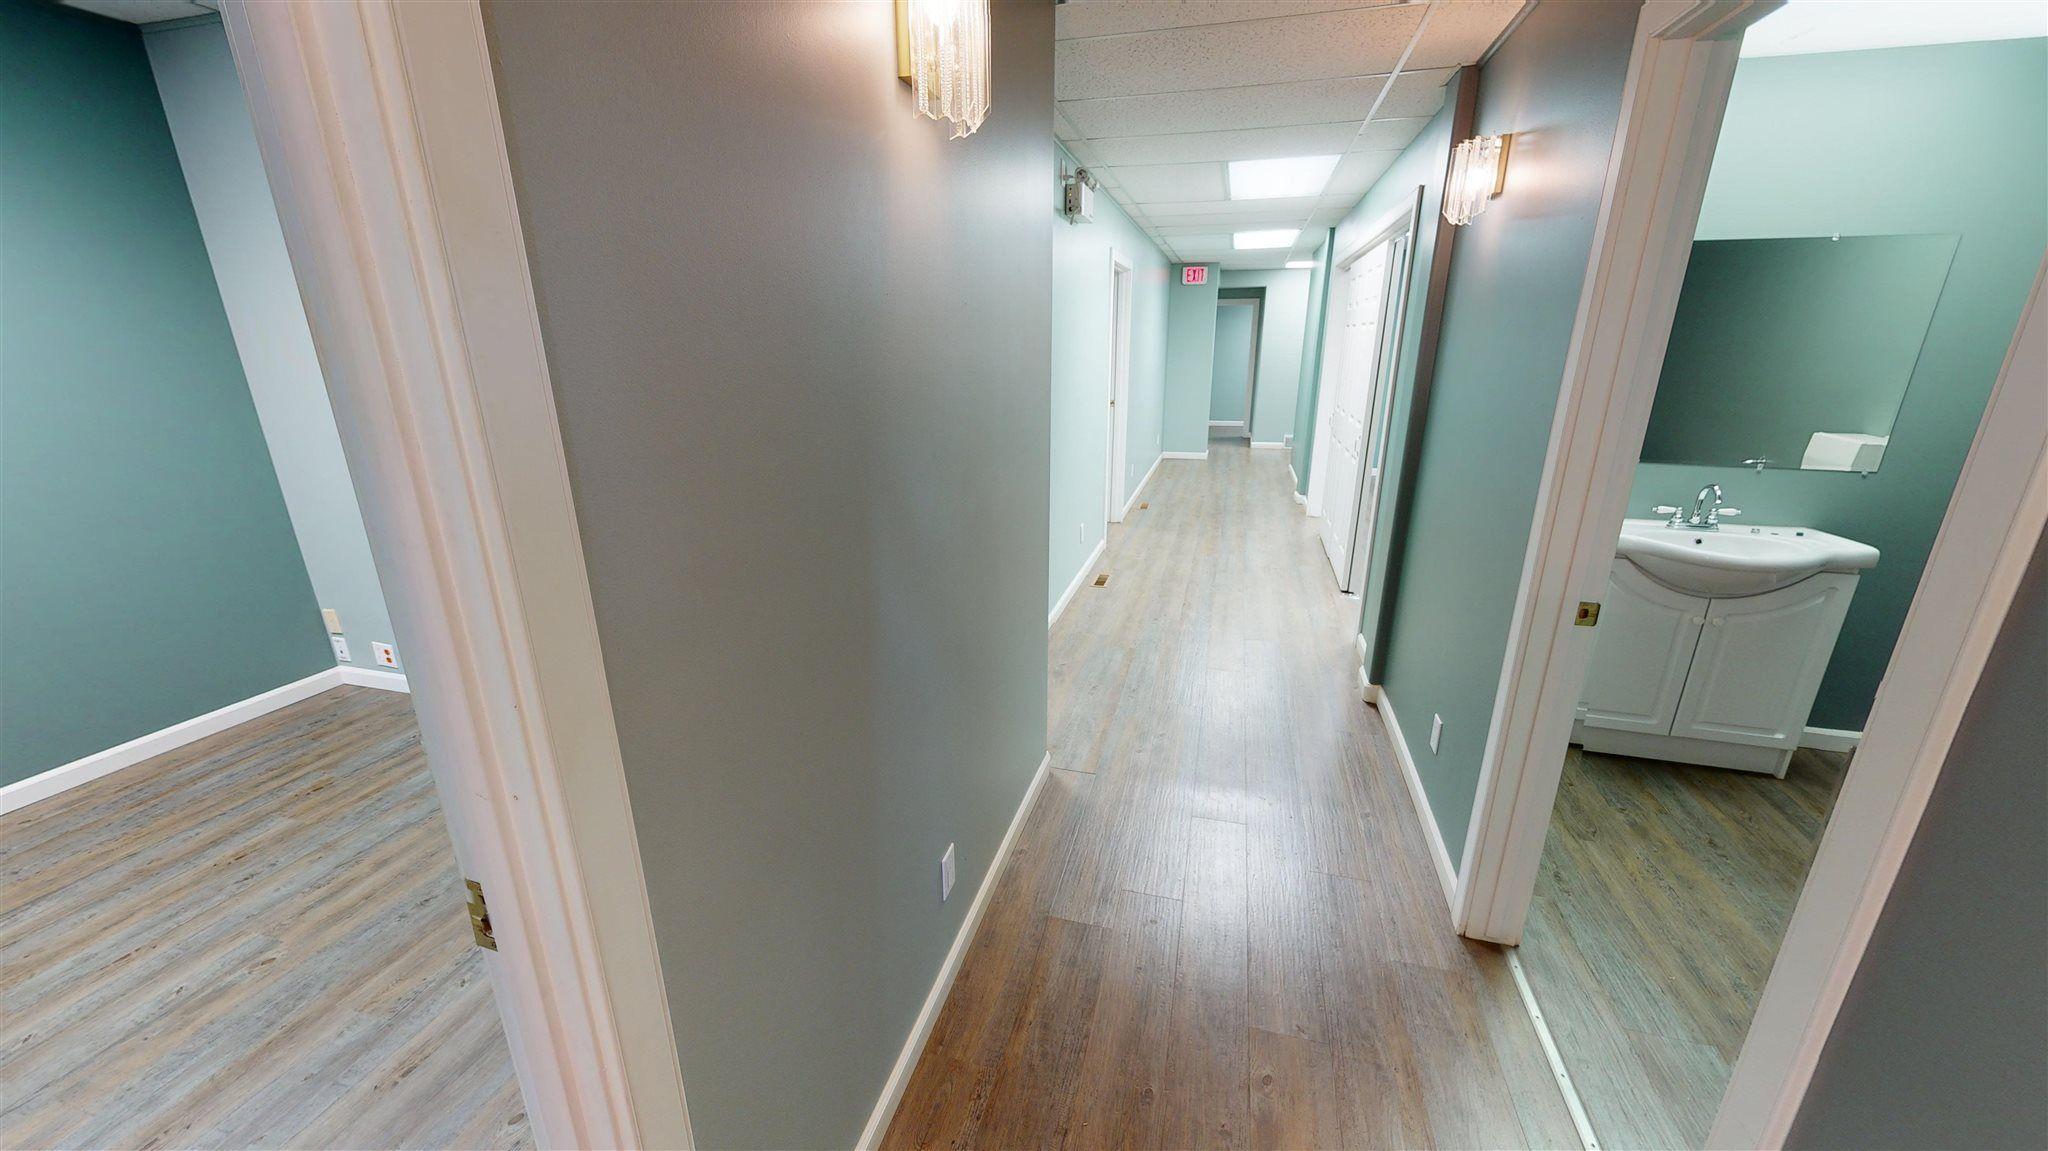 Photo 18: Photos: 10067 100 Avenue in Fort St. John: Fort St. John - City NW Office for sale (Fort St. John (Zone 60))  : MLS®# C8039097